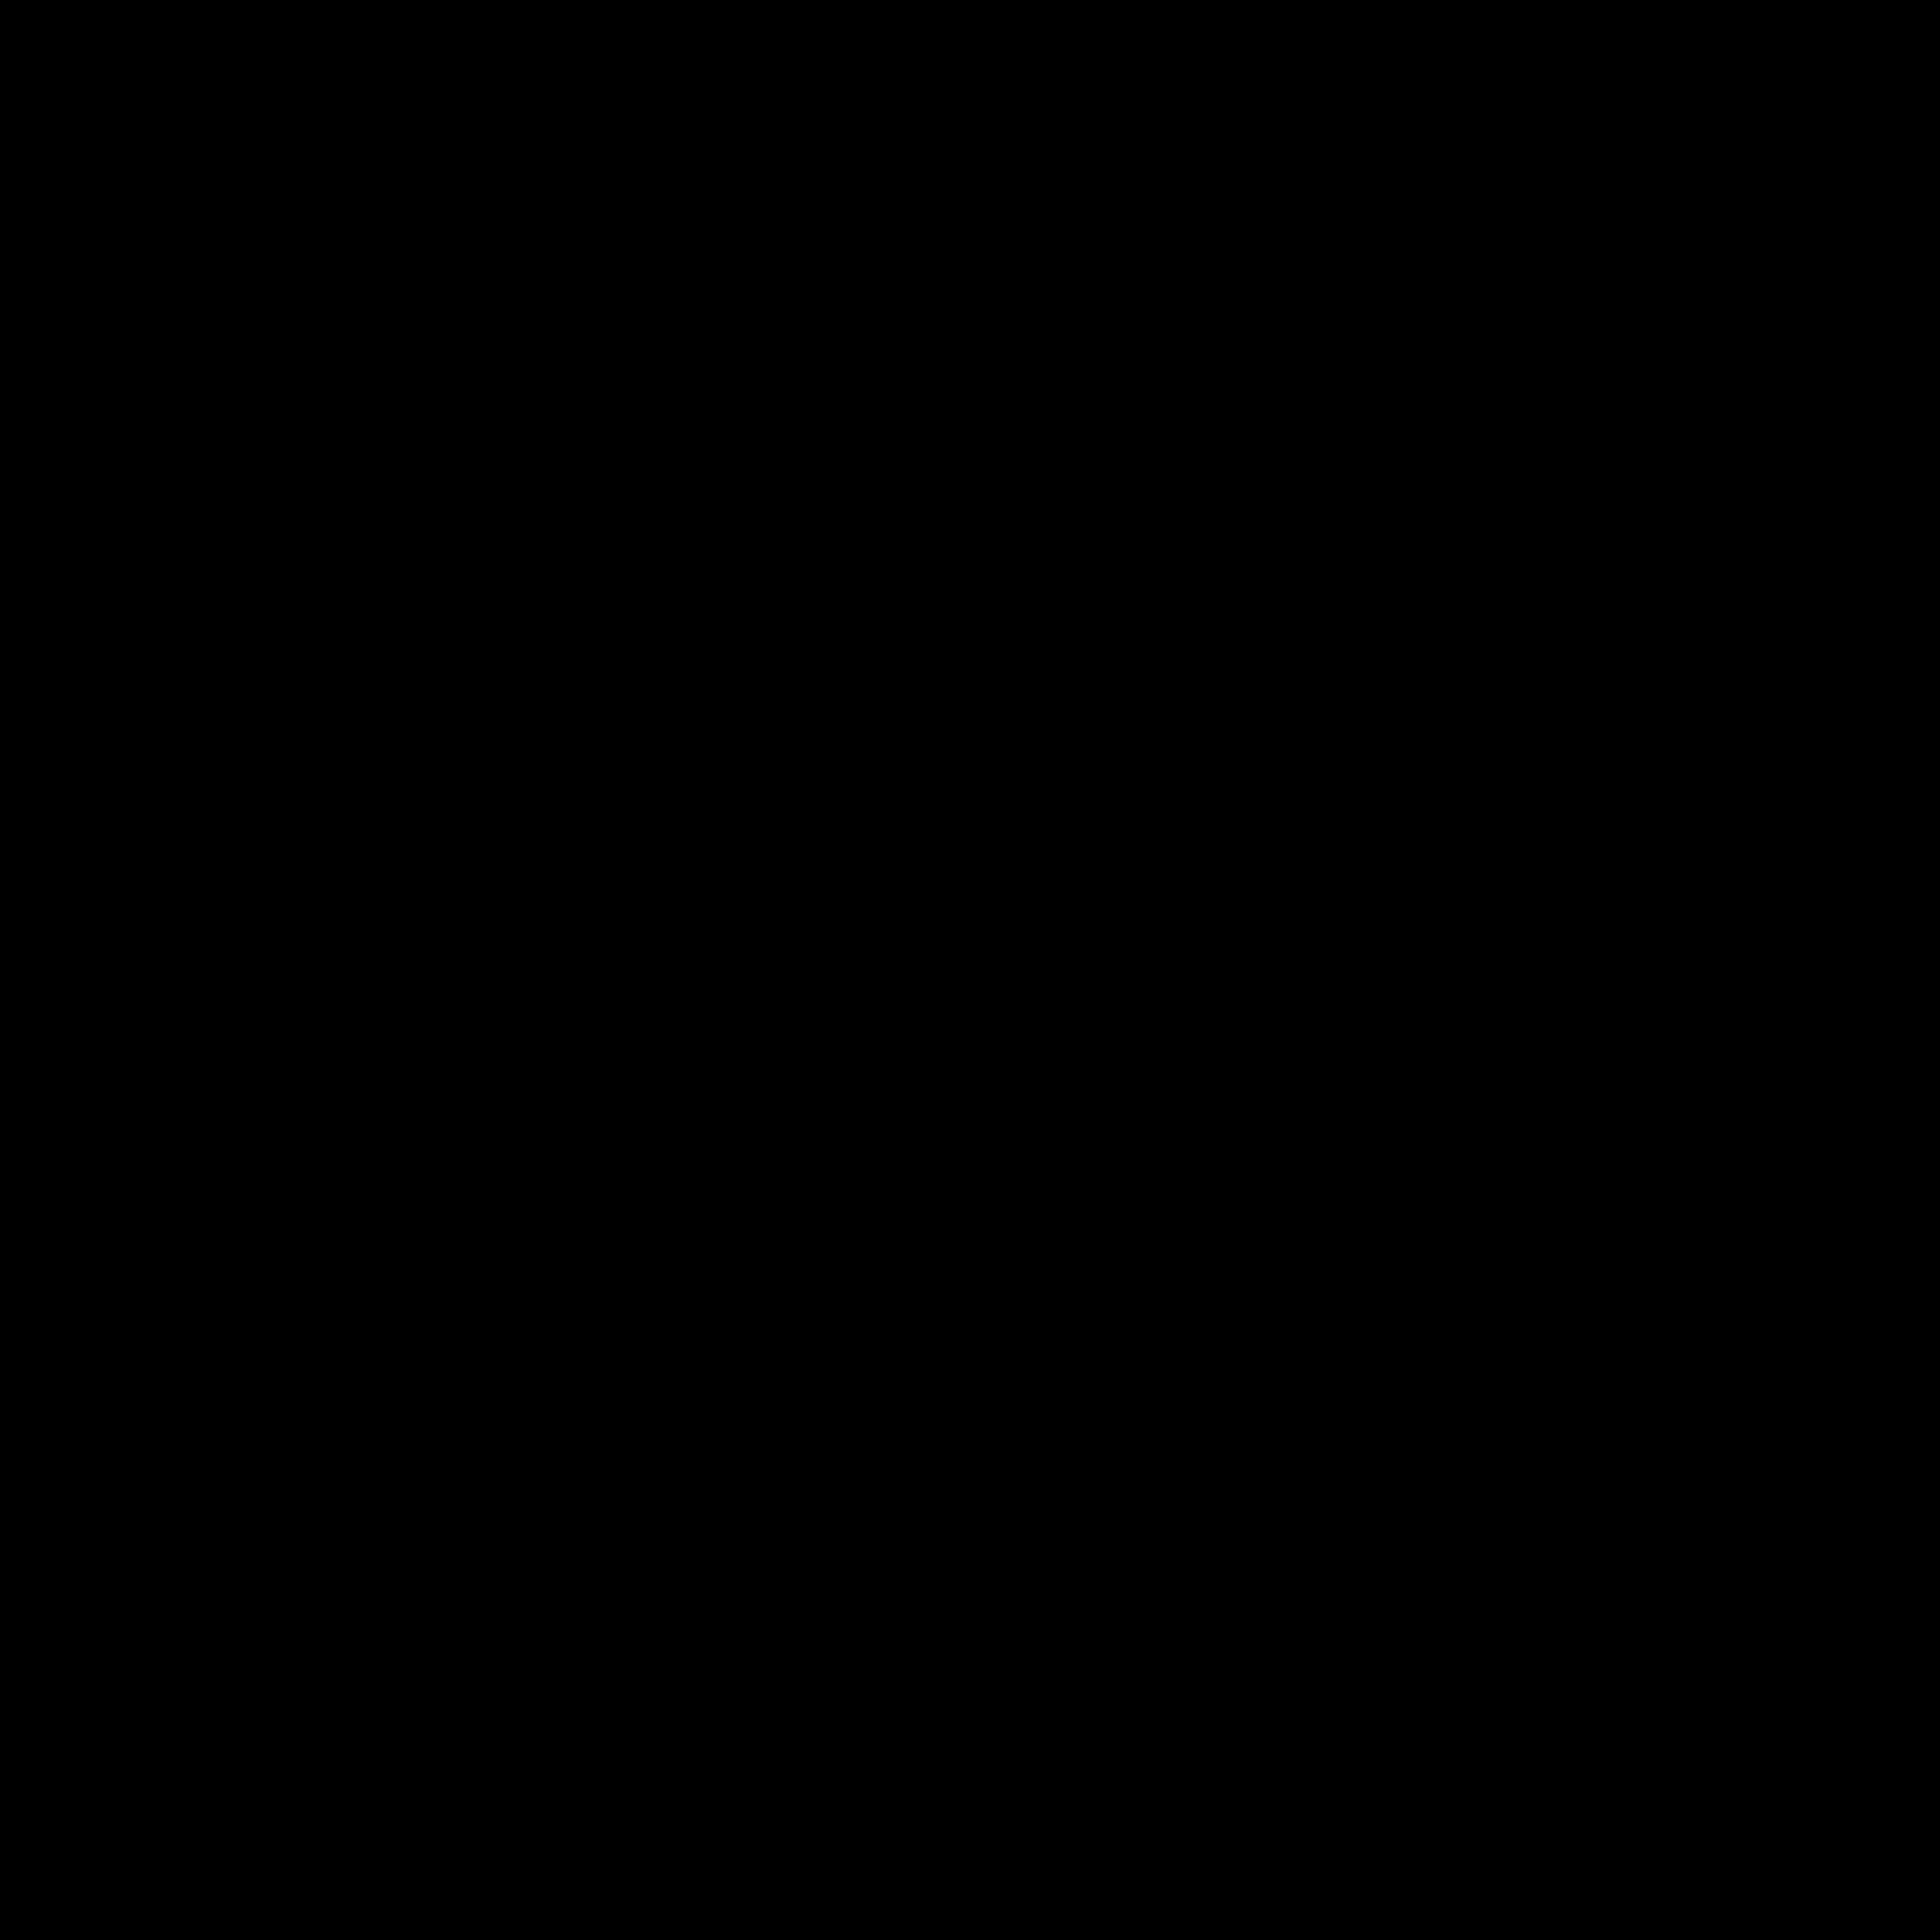 CIC Video Logo PNG Transparent & SVG Vector.